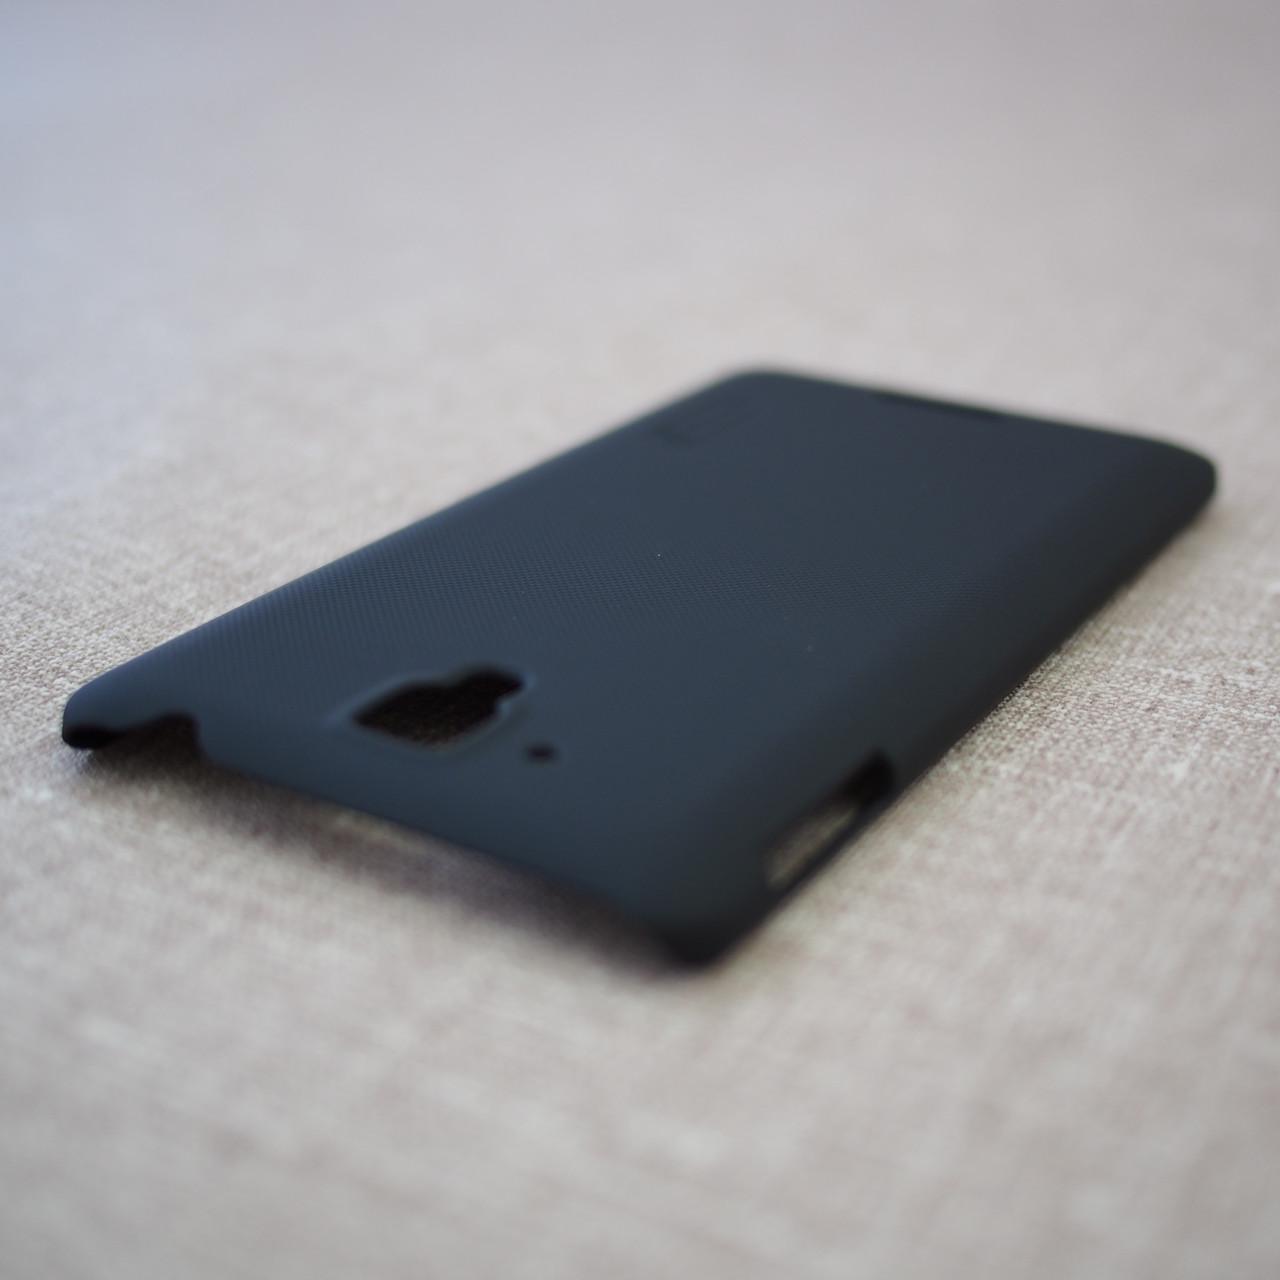 Nillkin Super Frosted Shield Lenovo S8 black